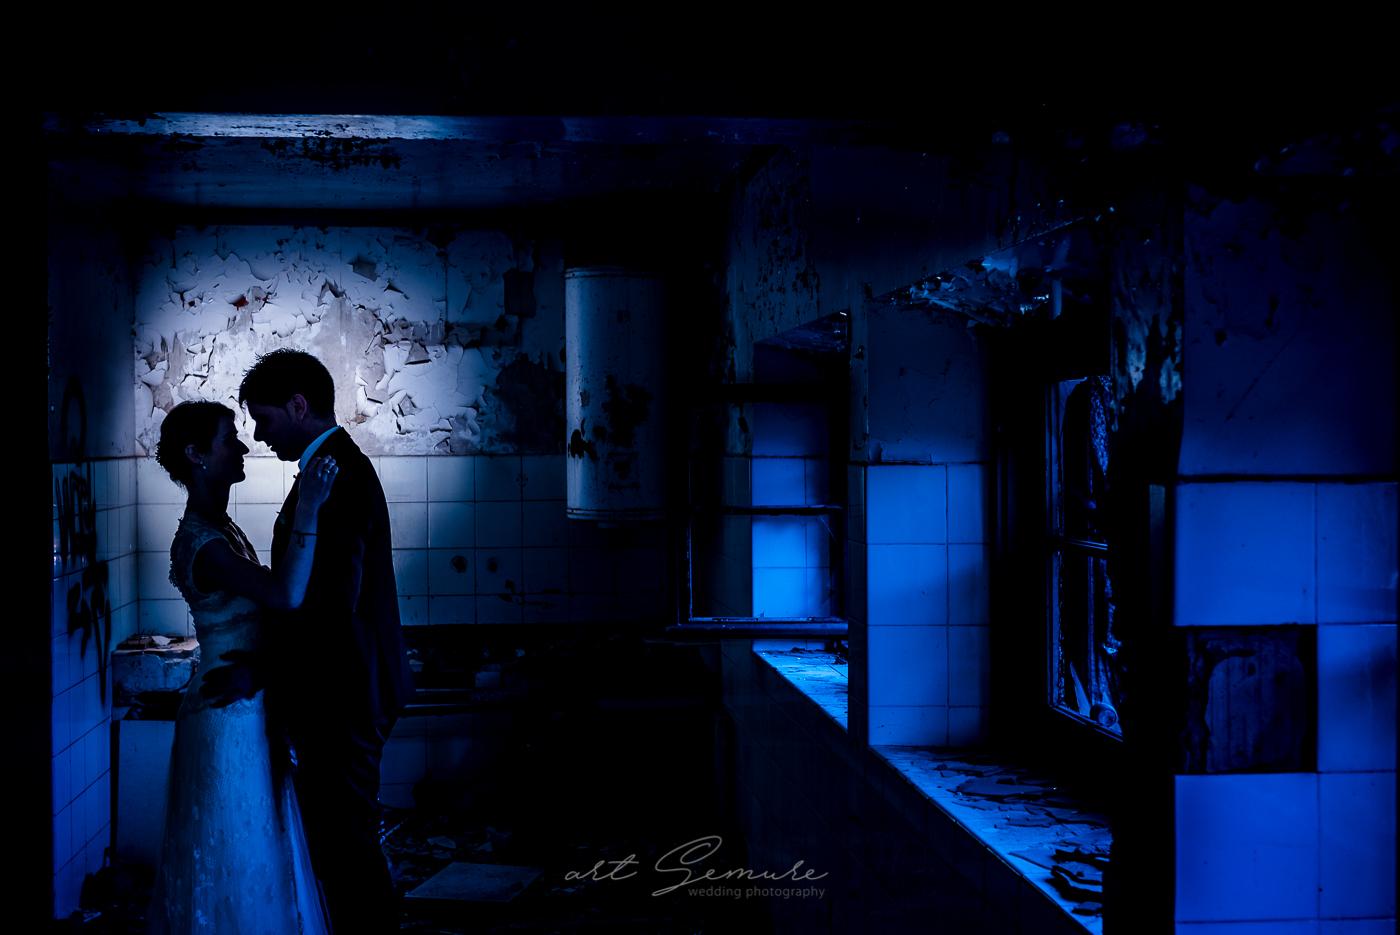 fotografo boda emotiva zamora salto de castro 14_